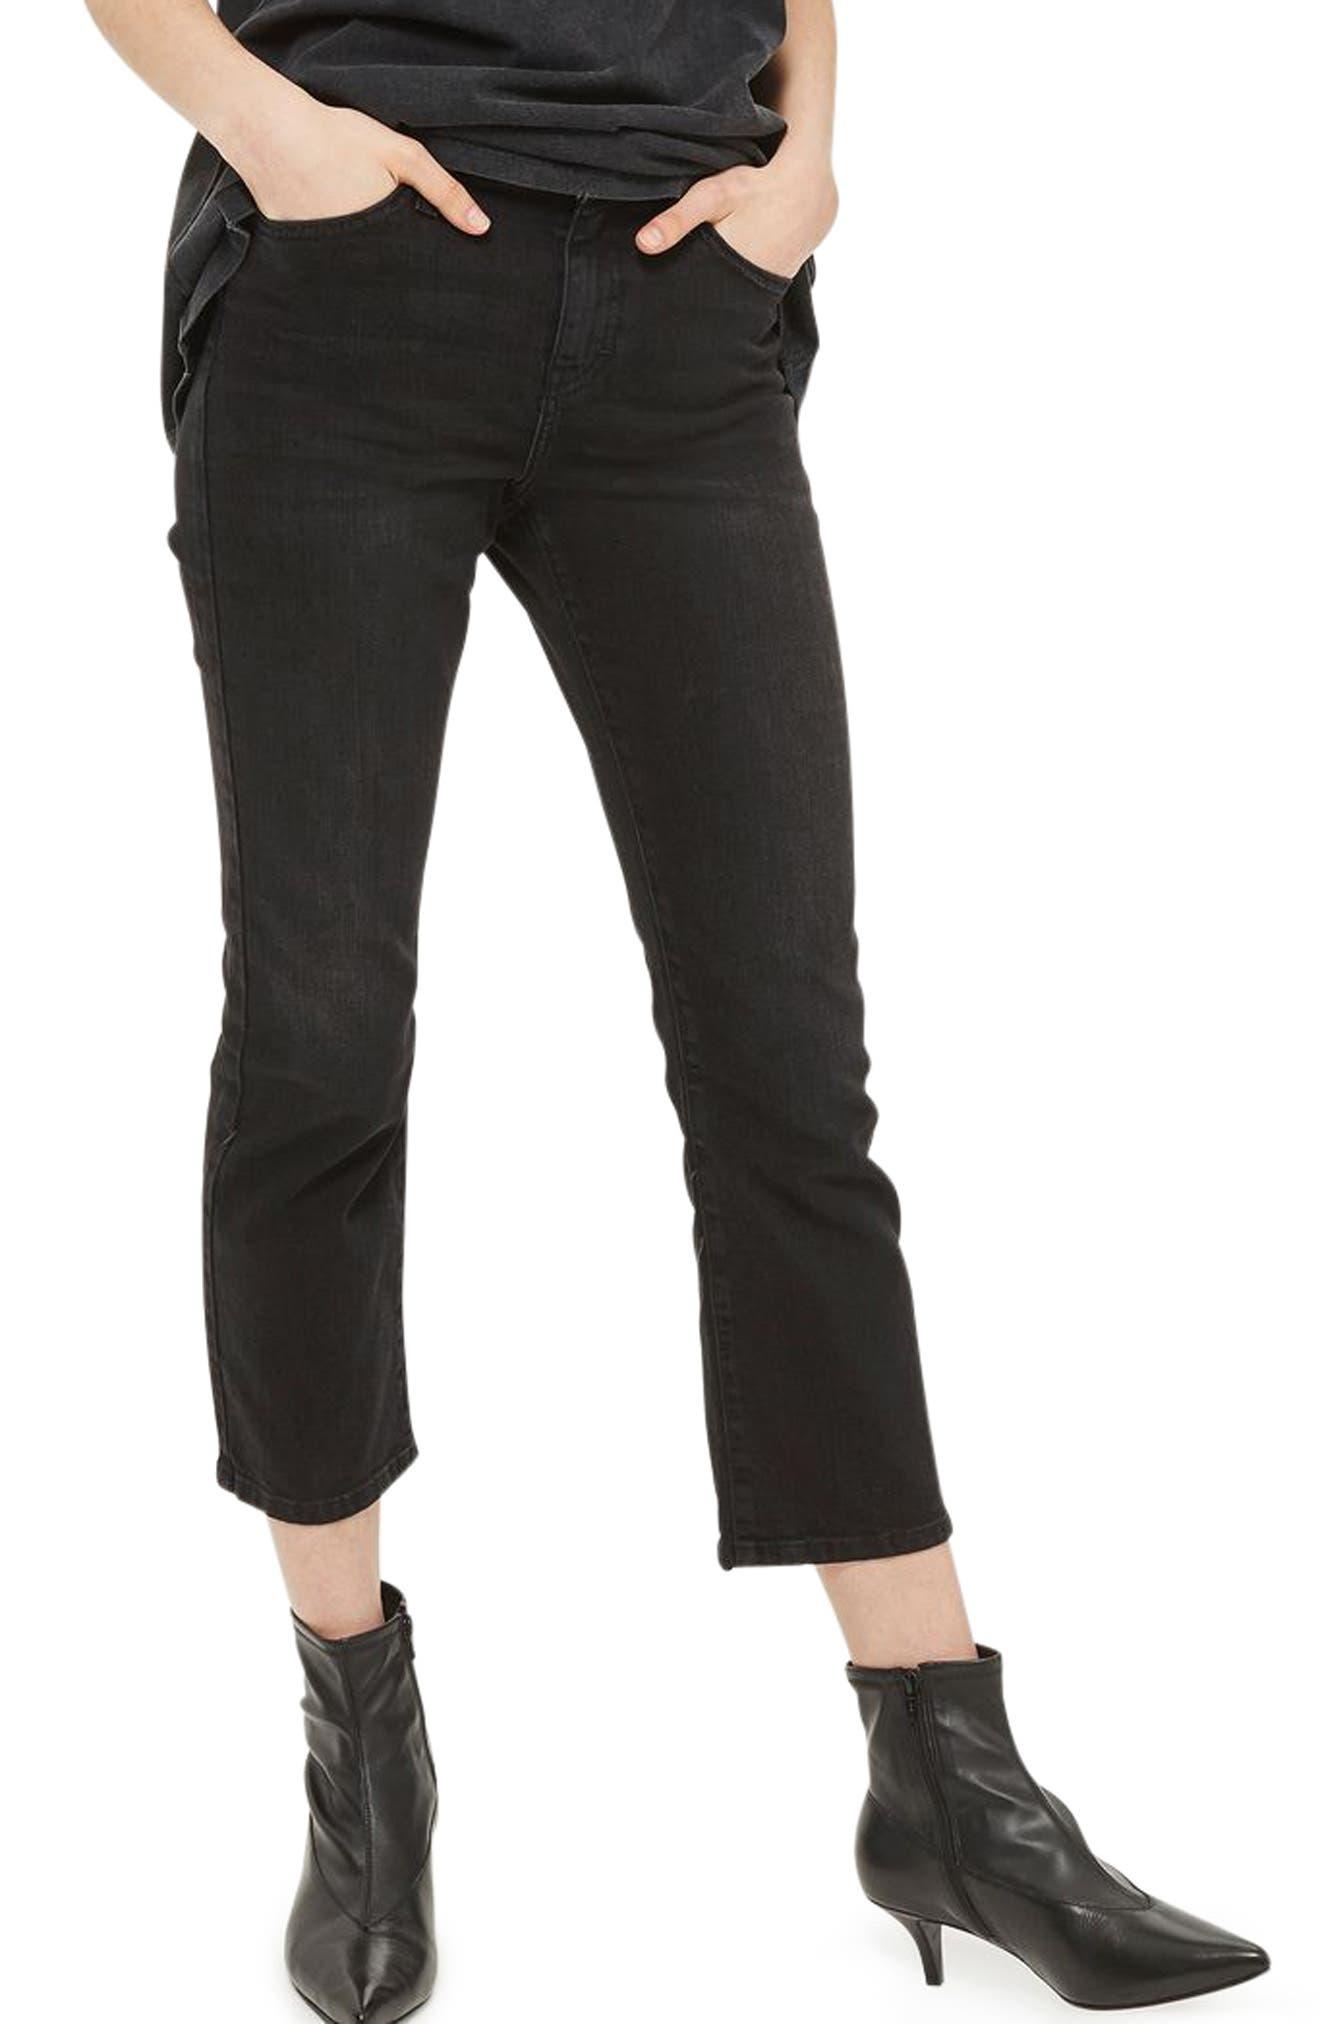 Dree Kick Flare Jeans,                         Main,                         color, 001